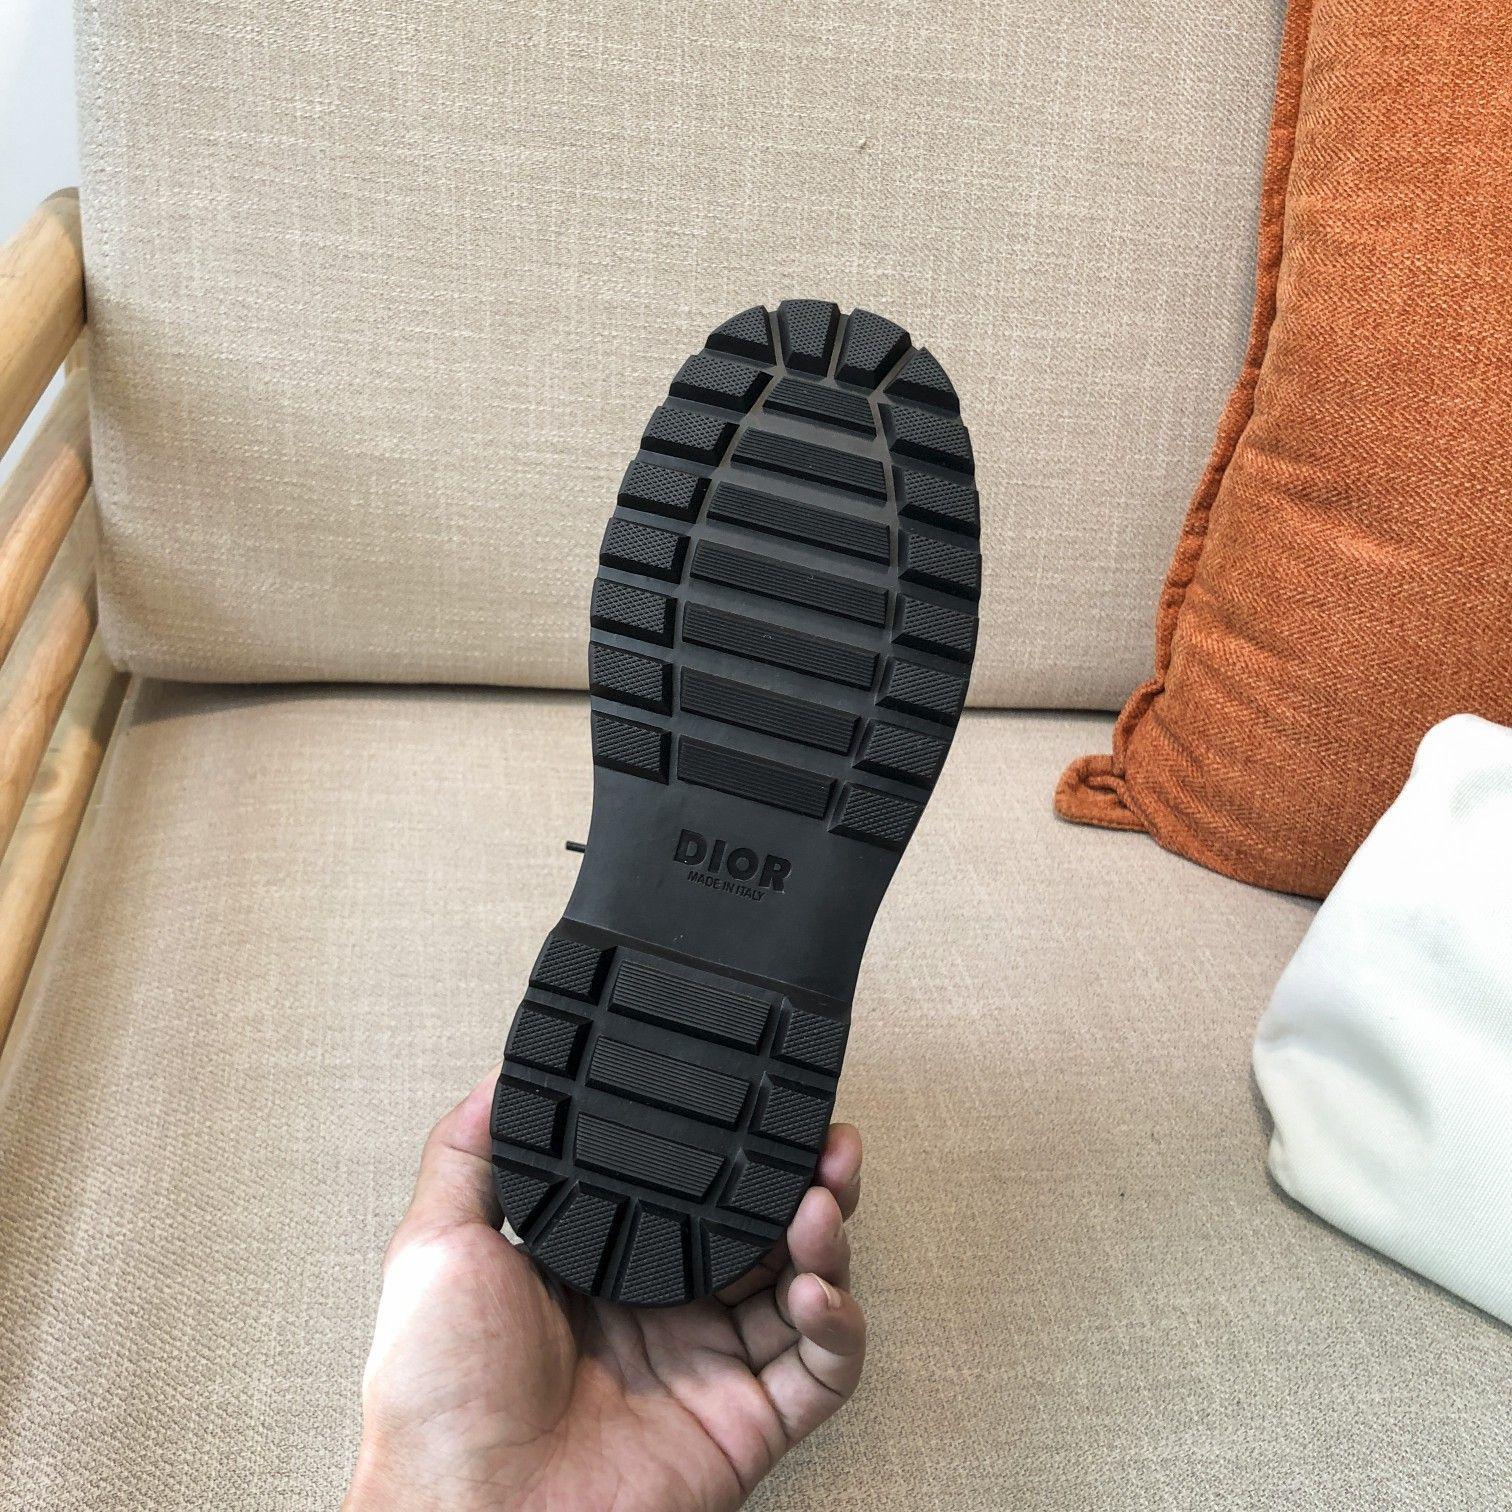 Dior高版本情侣 款2020ss秋冬新款字母厚底系带机车靴,秋冬T台走秀同款(图12)